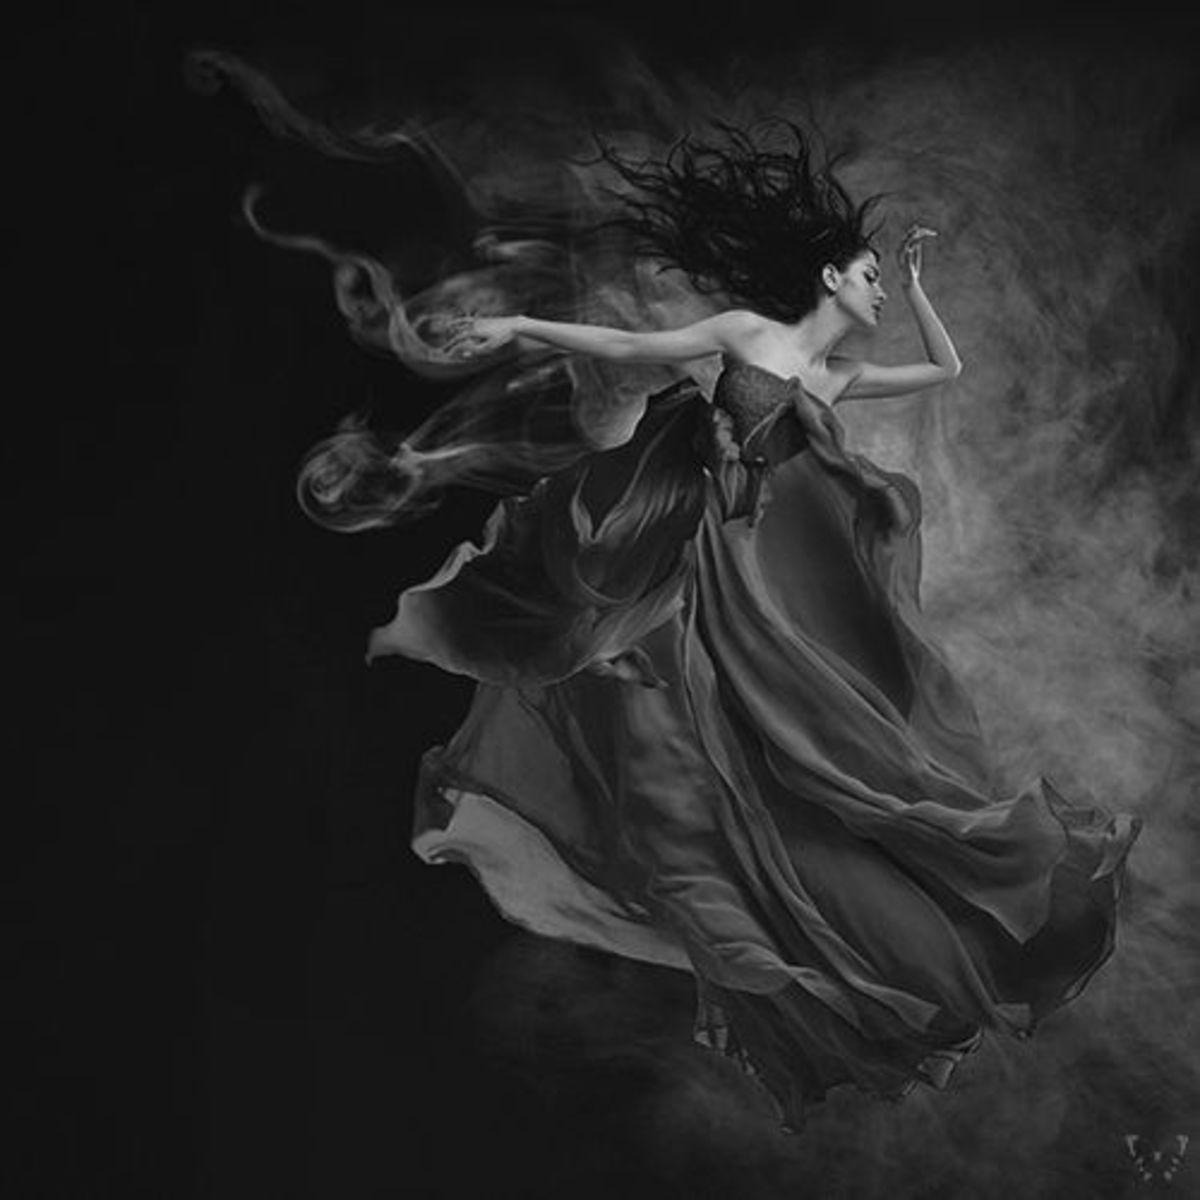 White soul black heart